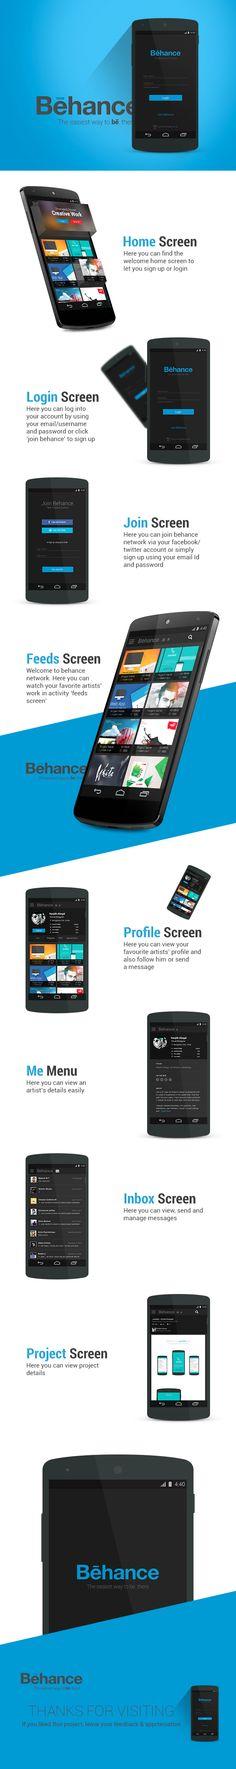 Behance Redesign Concept by Ranjith Alingal, via Behance Mobile Application Design, Mobile Ui Design, Ui Ux Design, Graphic Design, Gui Interface, User Interface Design, Android Design, Ui Design Inspiration, Ui Web